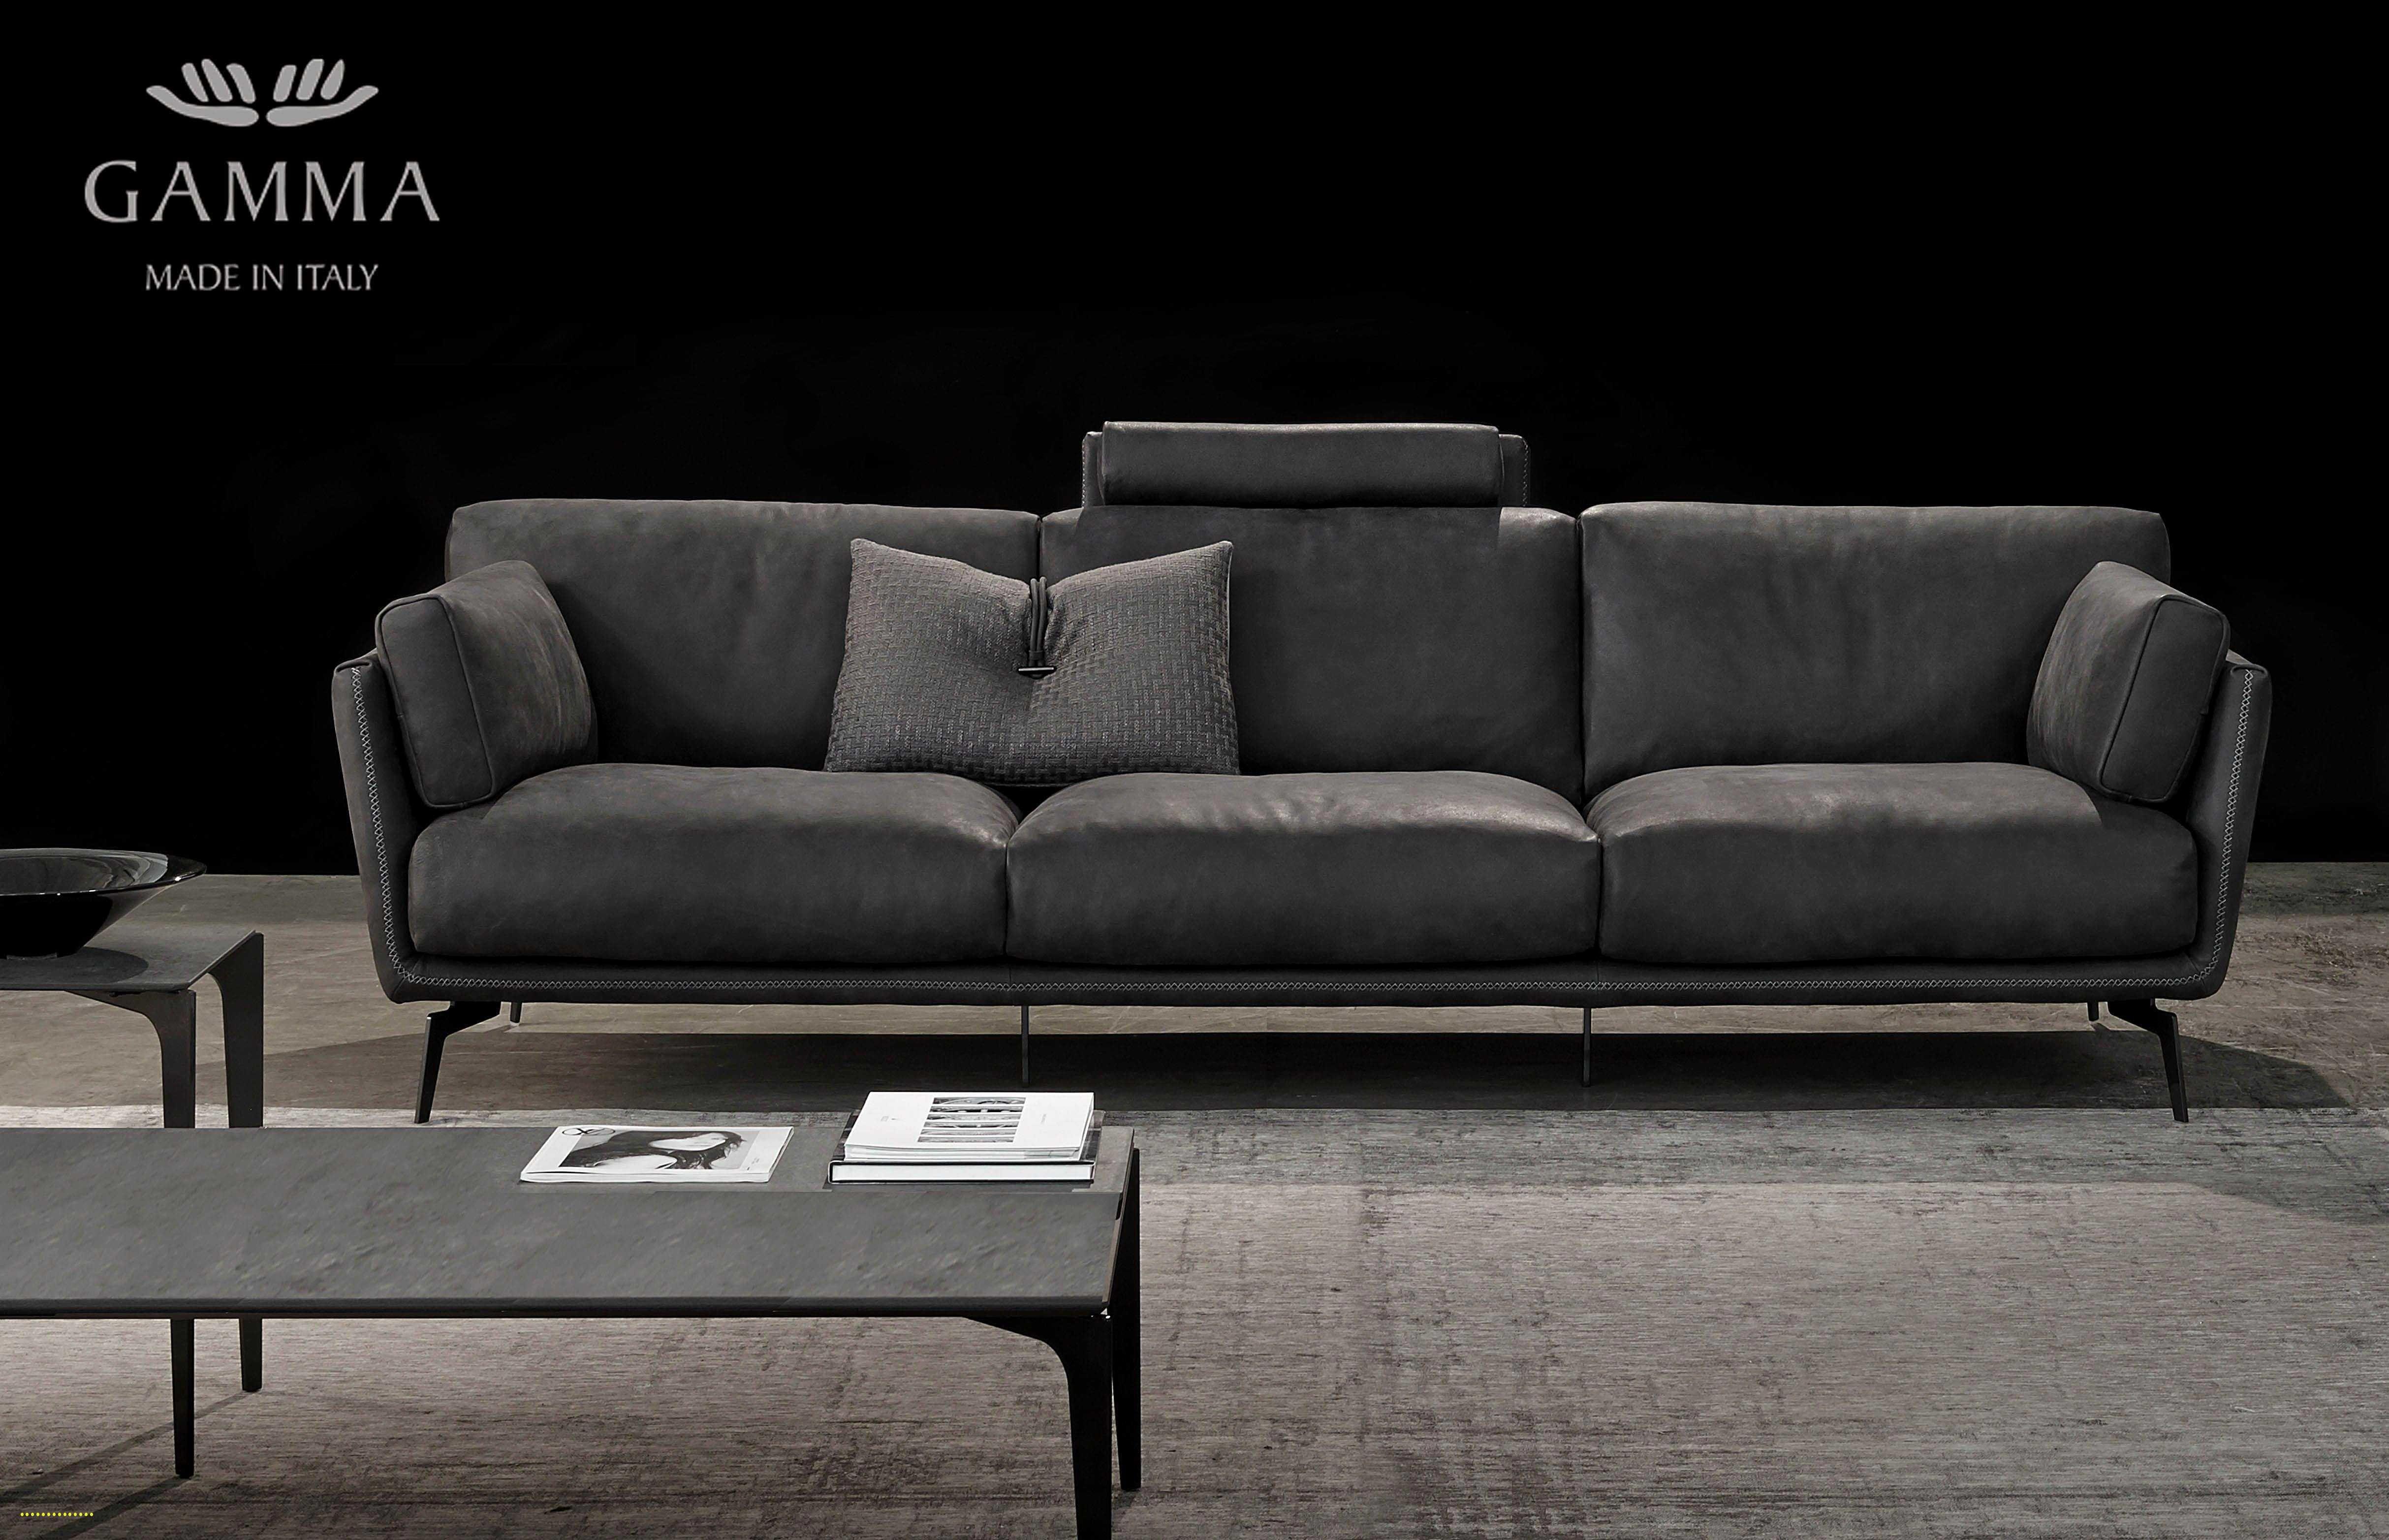 25 New Italian Furniture Brands